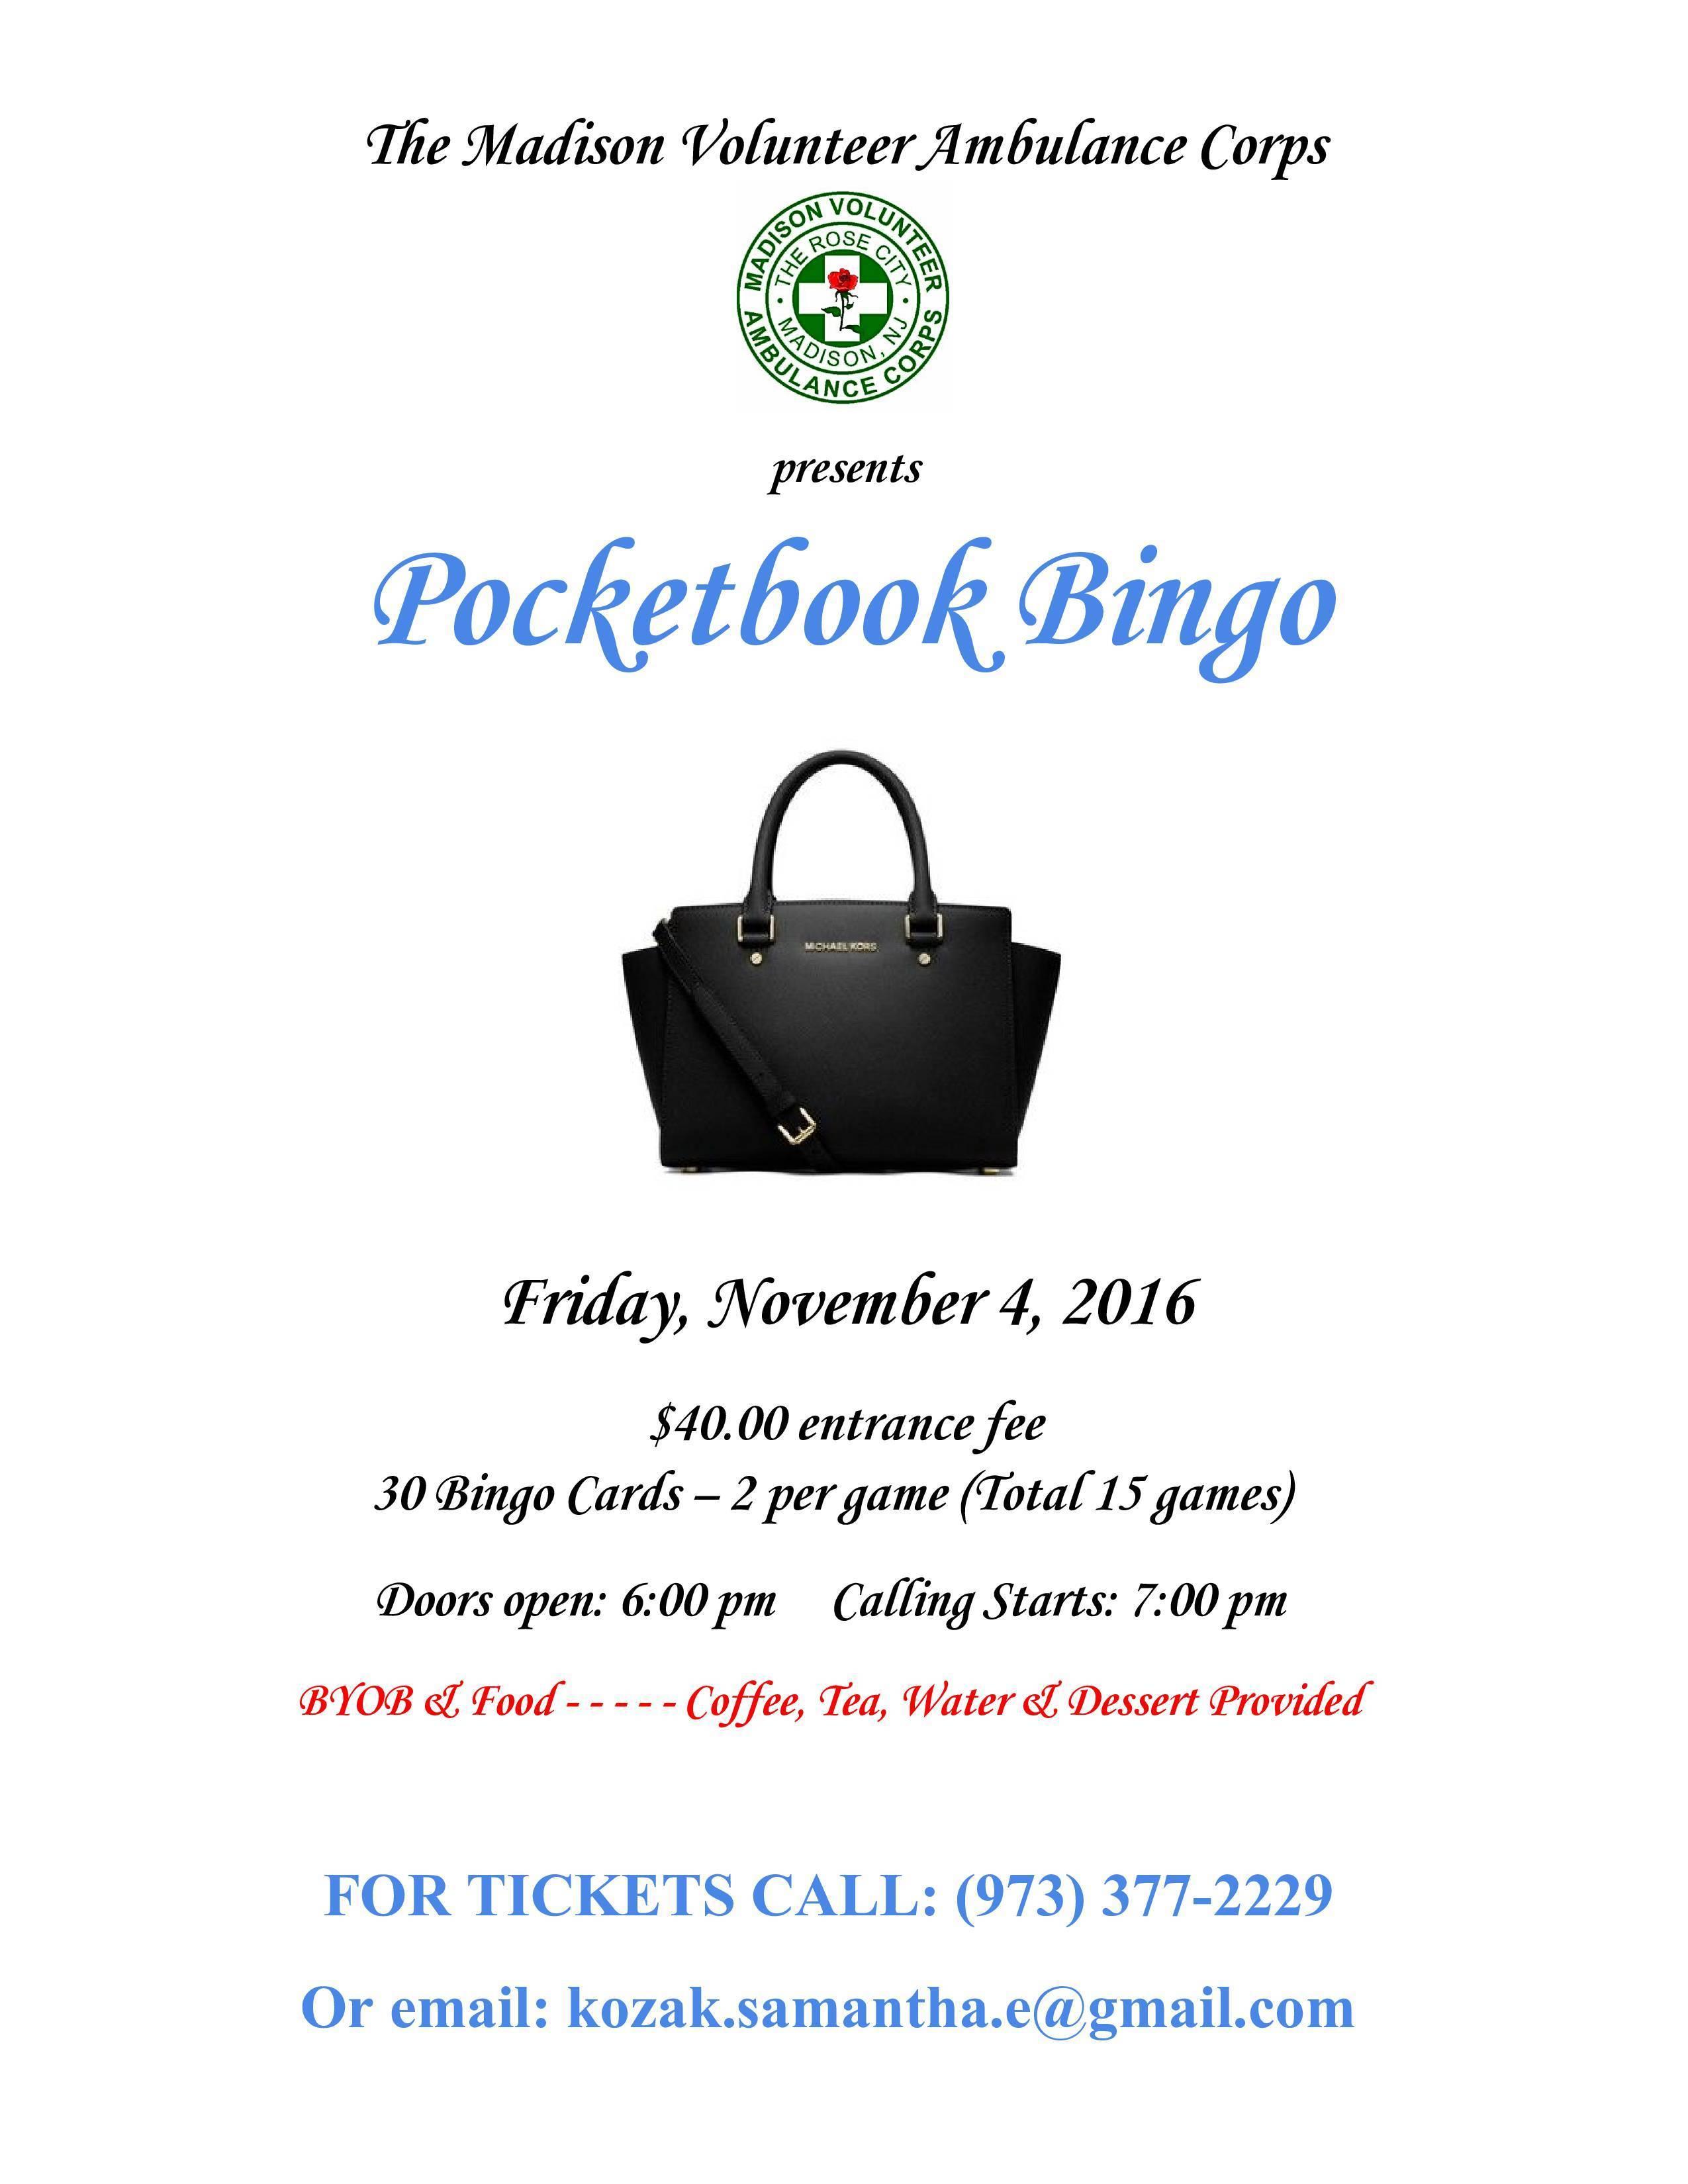 5e3a8e3df85d328e7877_Copy_of_Pocketbook_Bingo_-_Flyer_-November_4_2016__docx.jpg